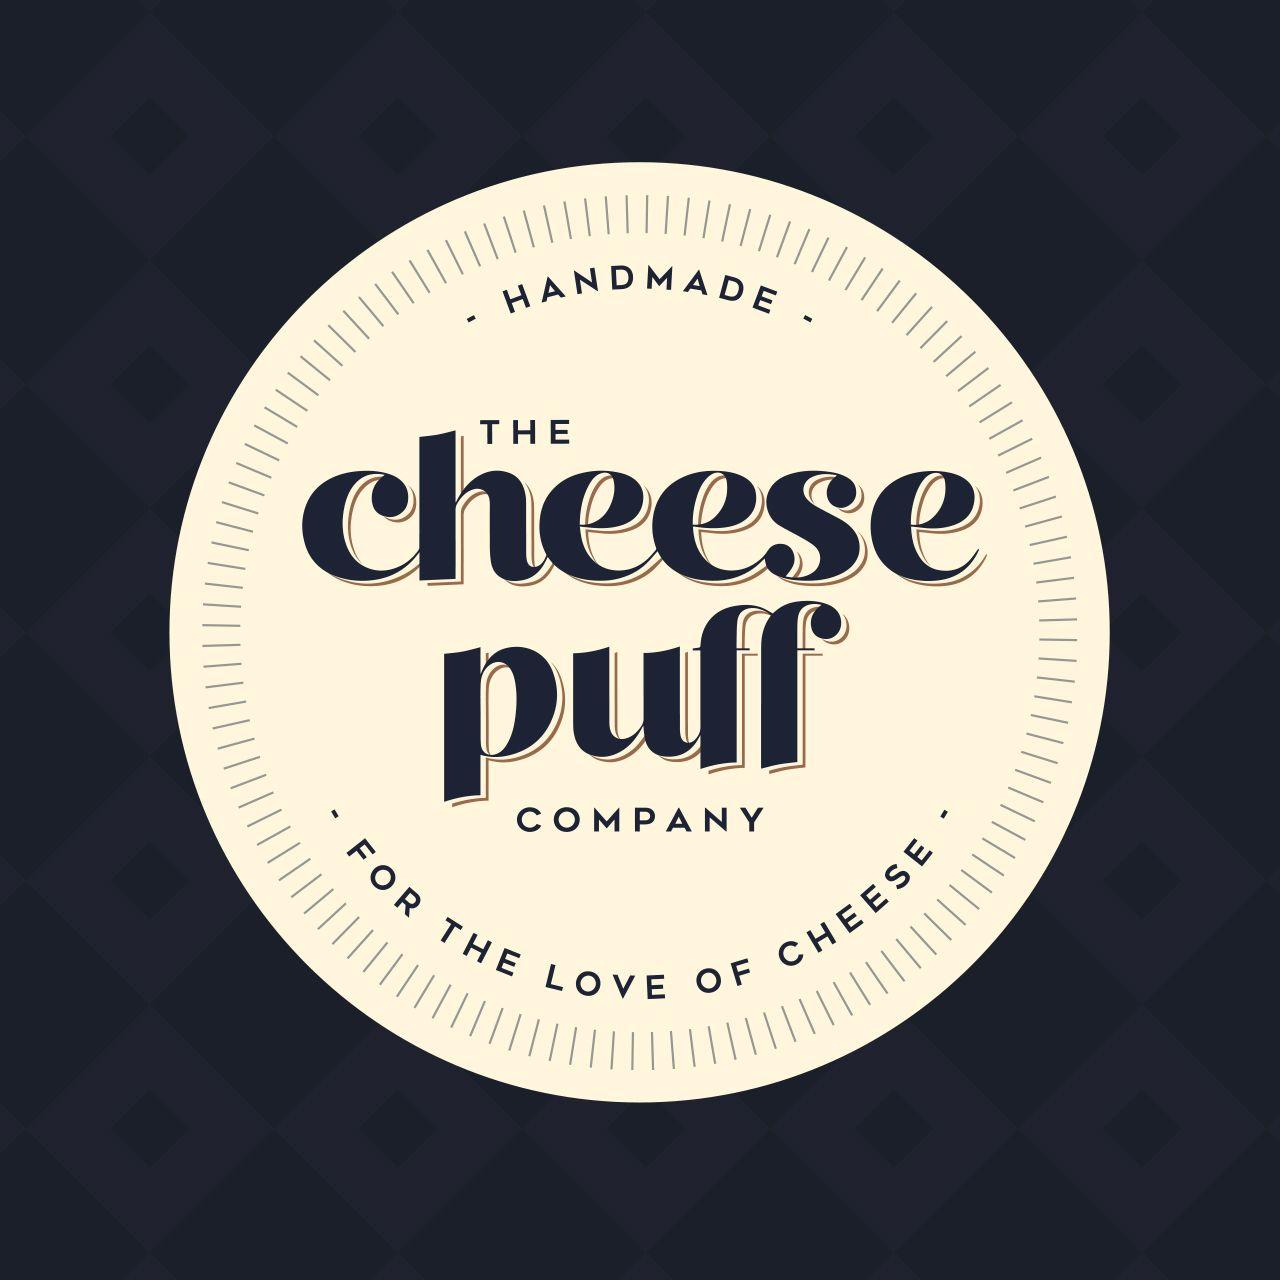 Cheesepuff Company Branding Packaging